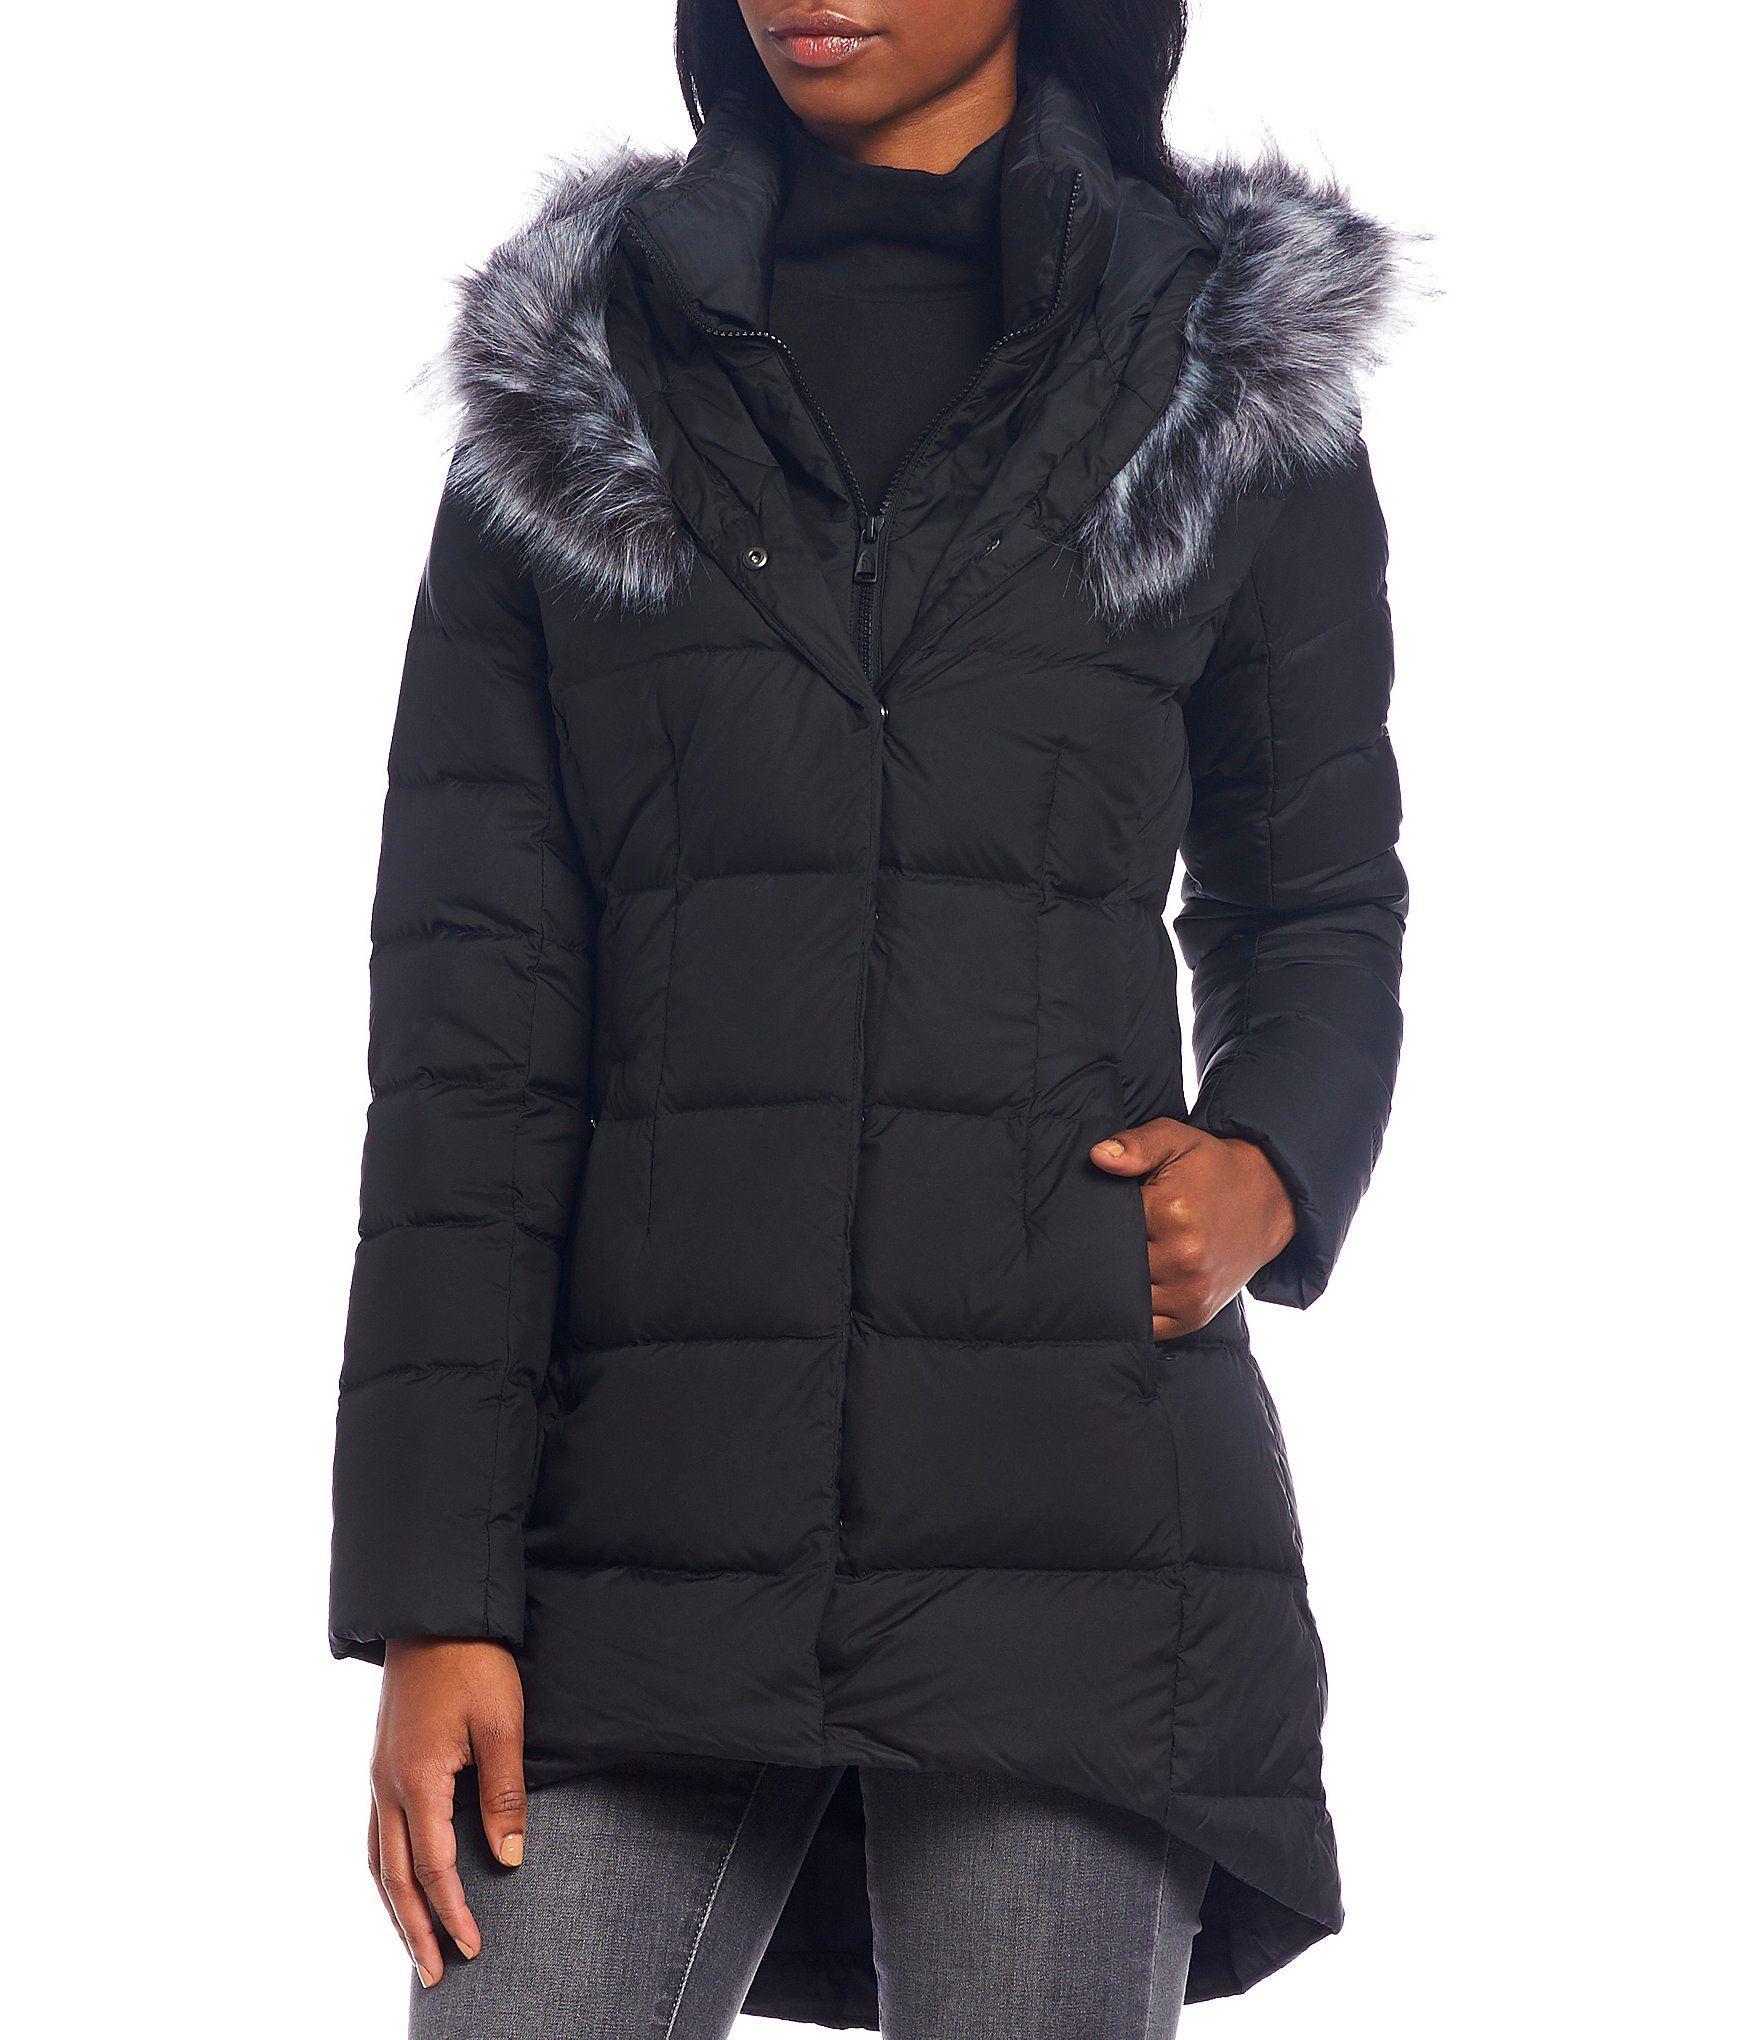 The North Face Dealio Down Parka Puffer Coat Dillard S The North Face Black North Face Long Coat Women [ 2040 x 1760 Pixel ]